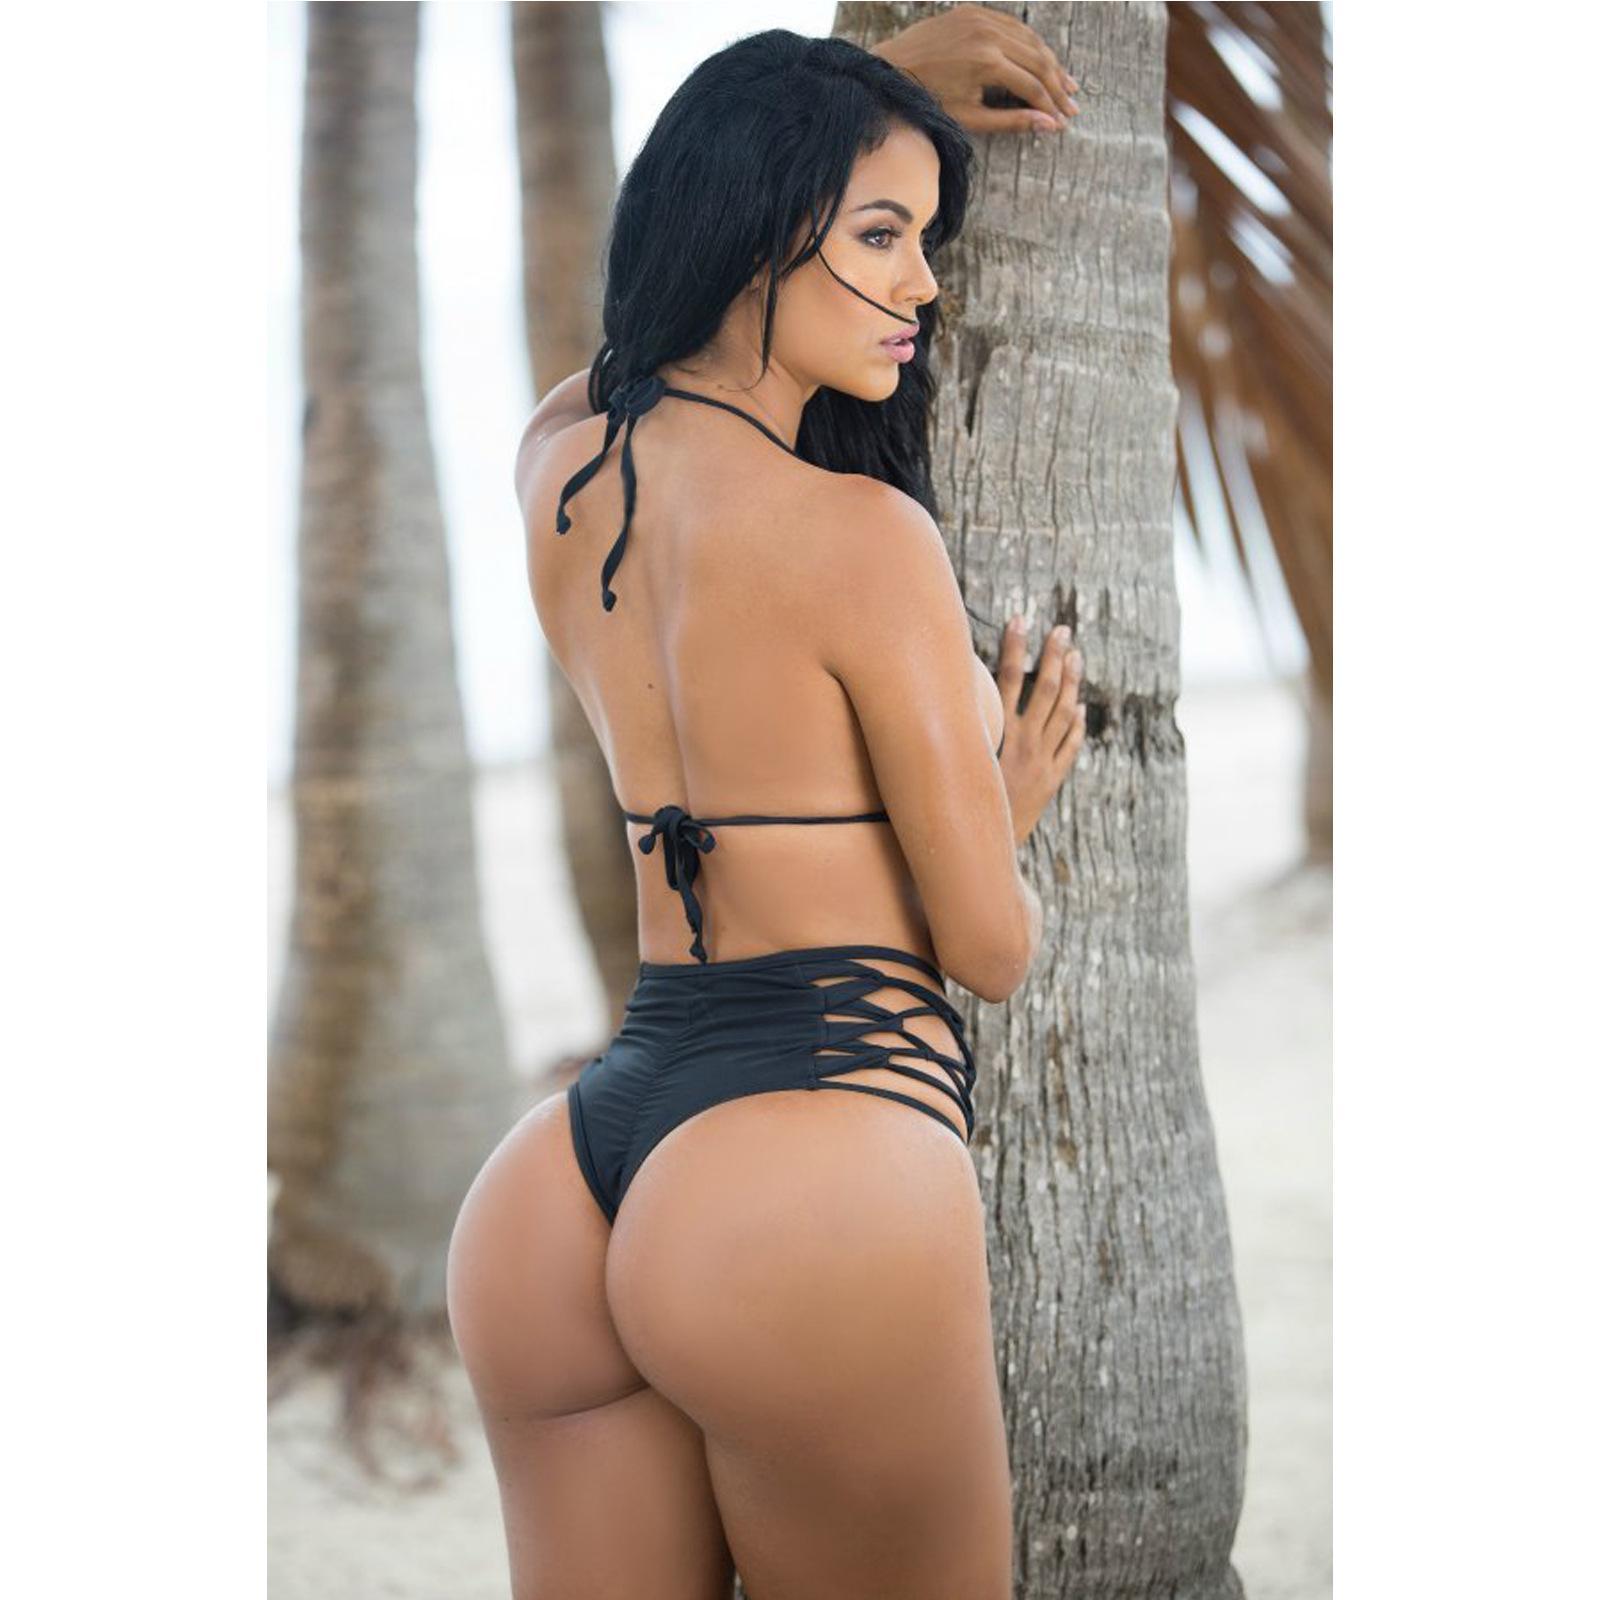 2016 Seksi Ucuz Strappy Bandaj Yüksek Belli Bikini Alt Hollow-out Siyah Halter Dize Mayo kadın Mayo Mayo